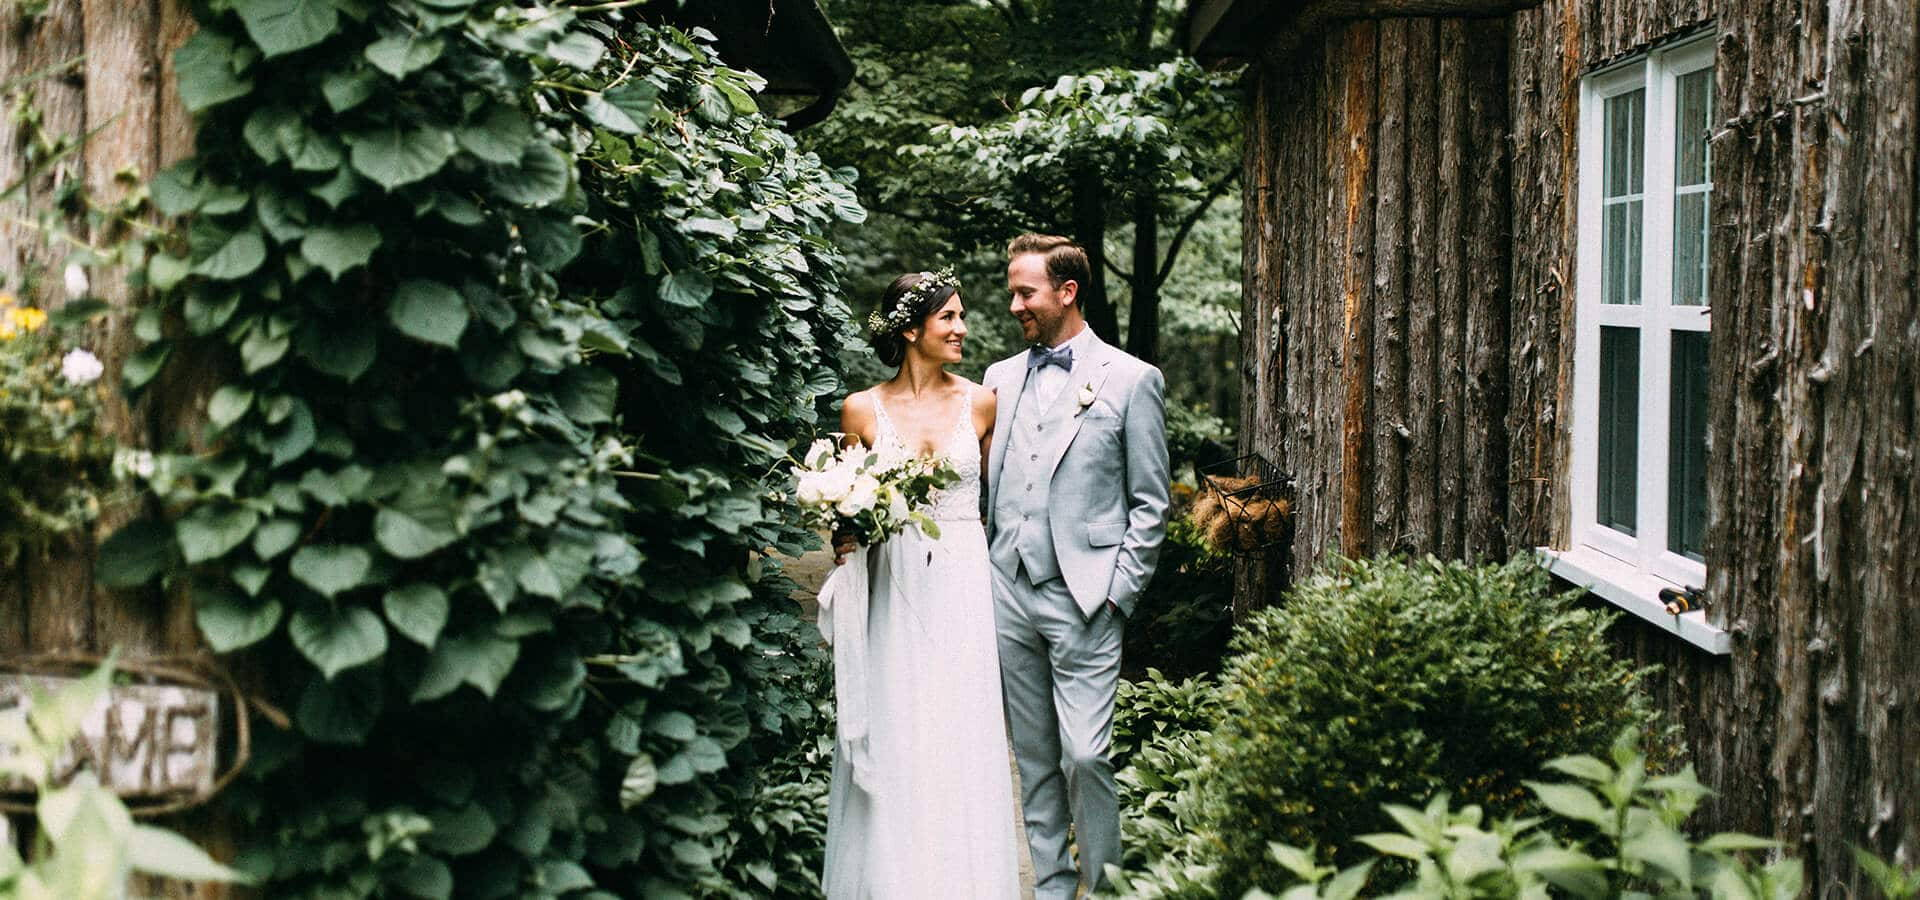 Hero image for Kelly and Sean's Romantic Wedding at Ravine Vineyards